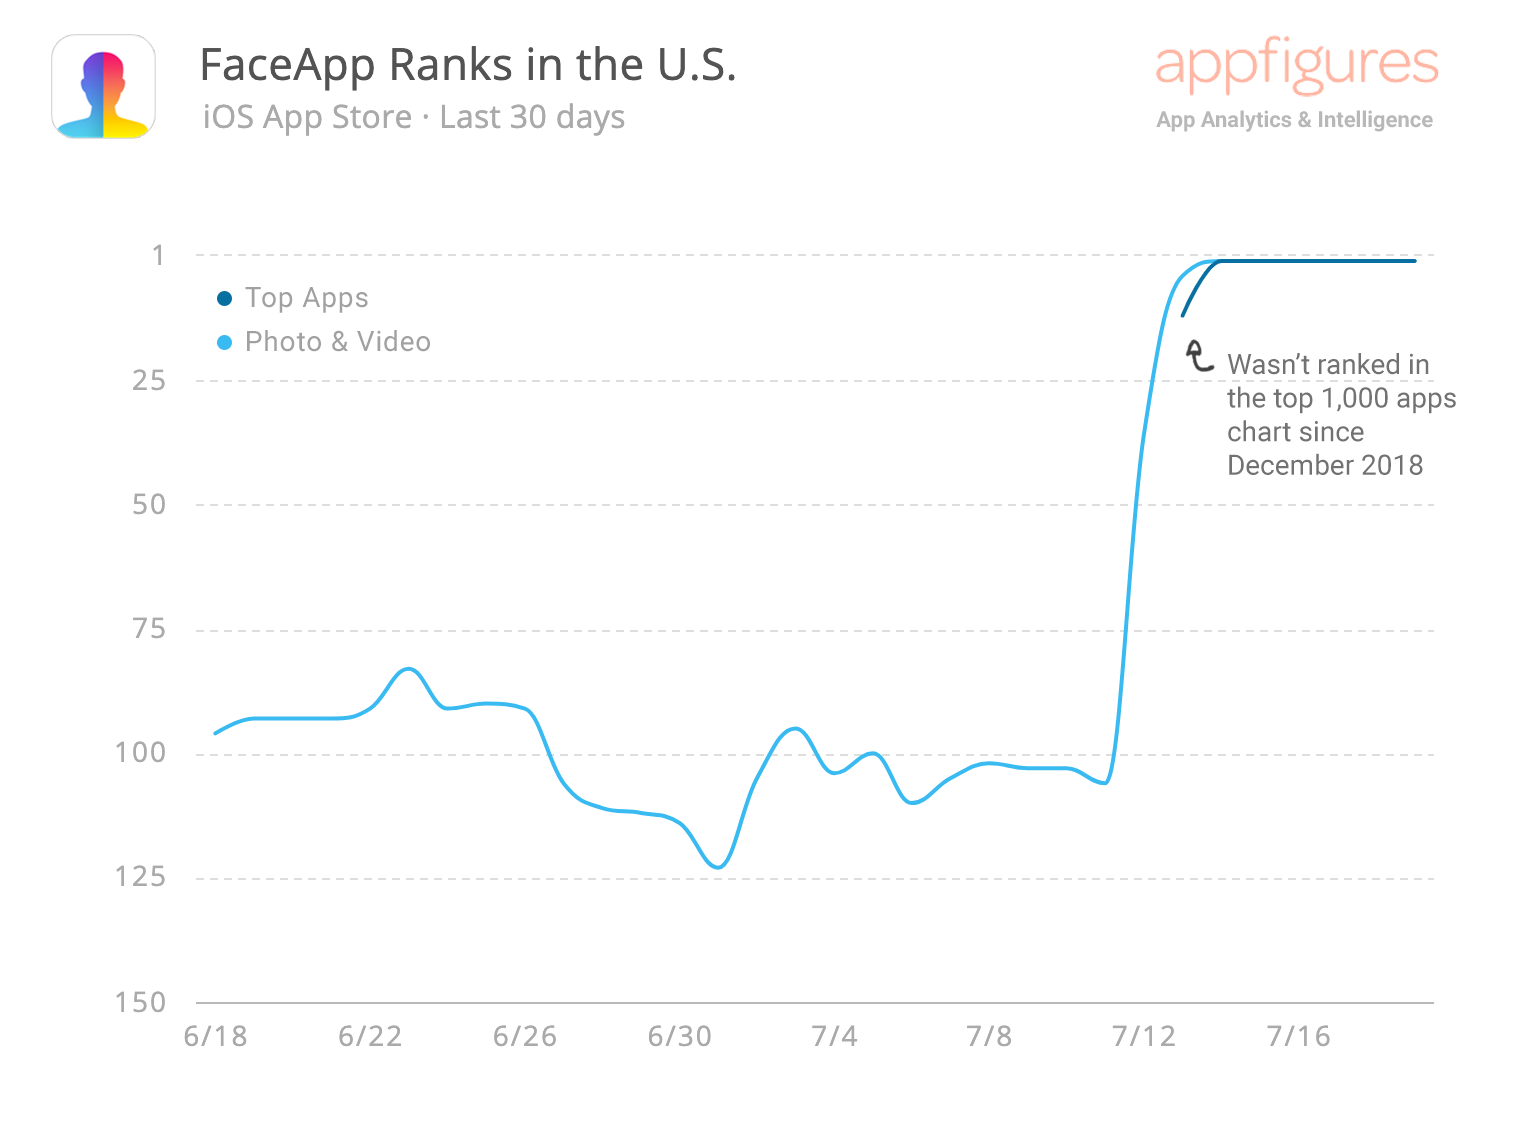 FaceApp App Store ranks by Appfigures